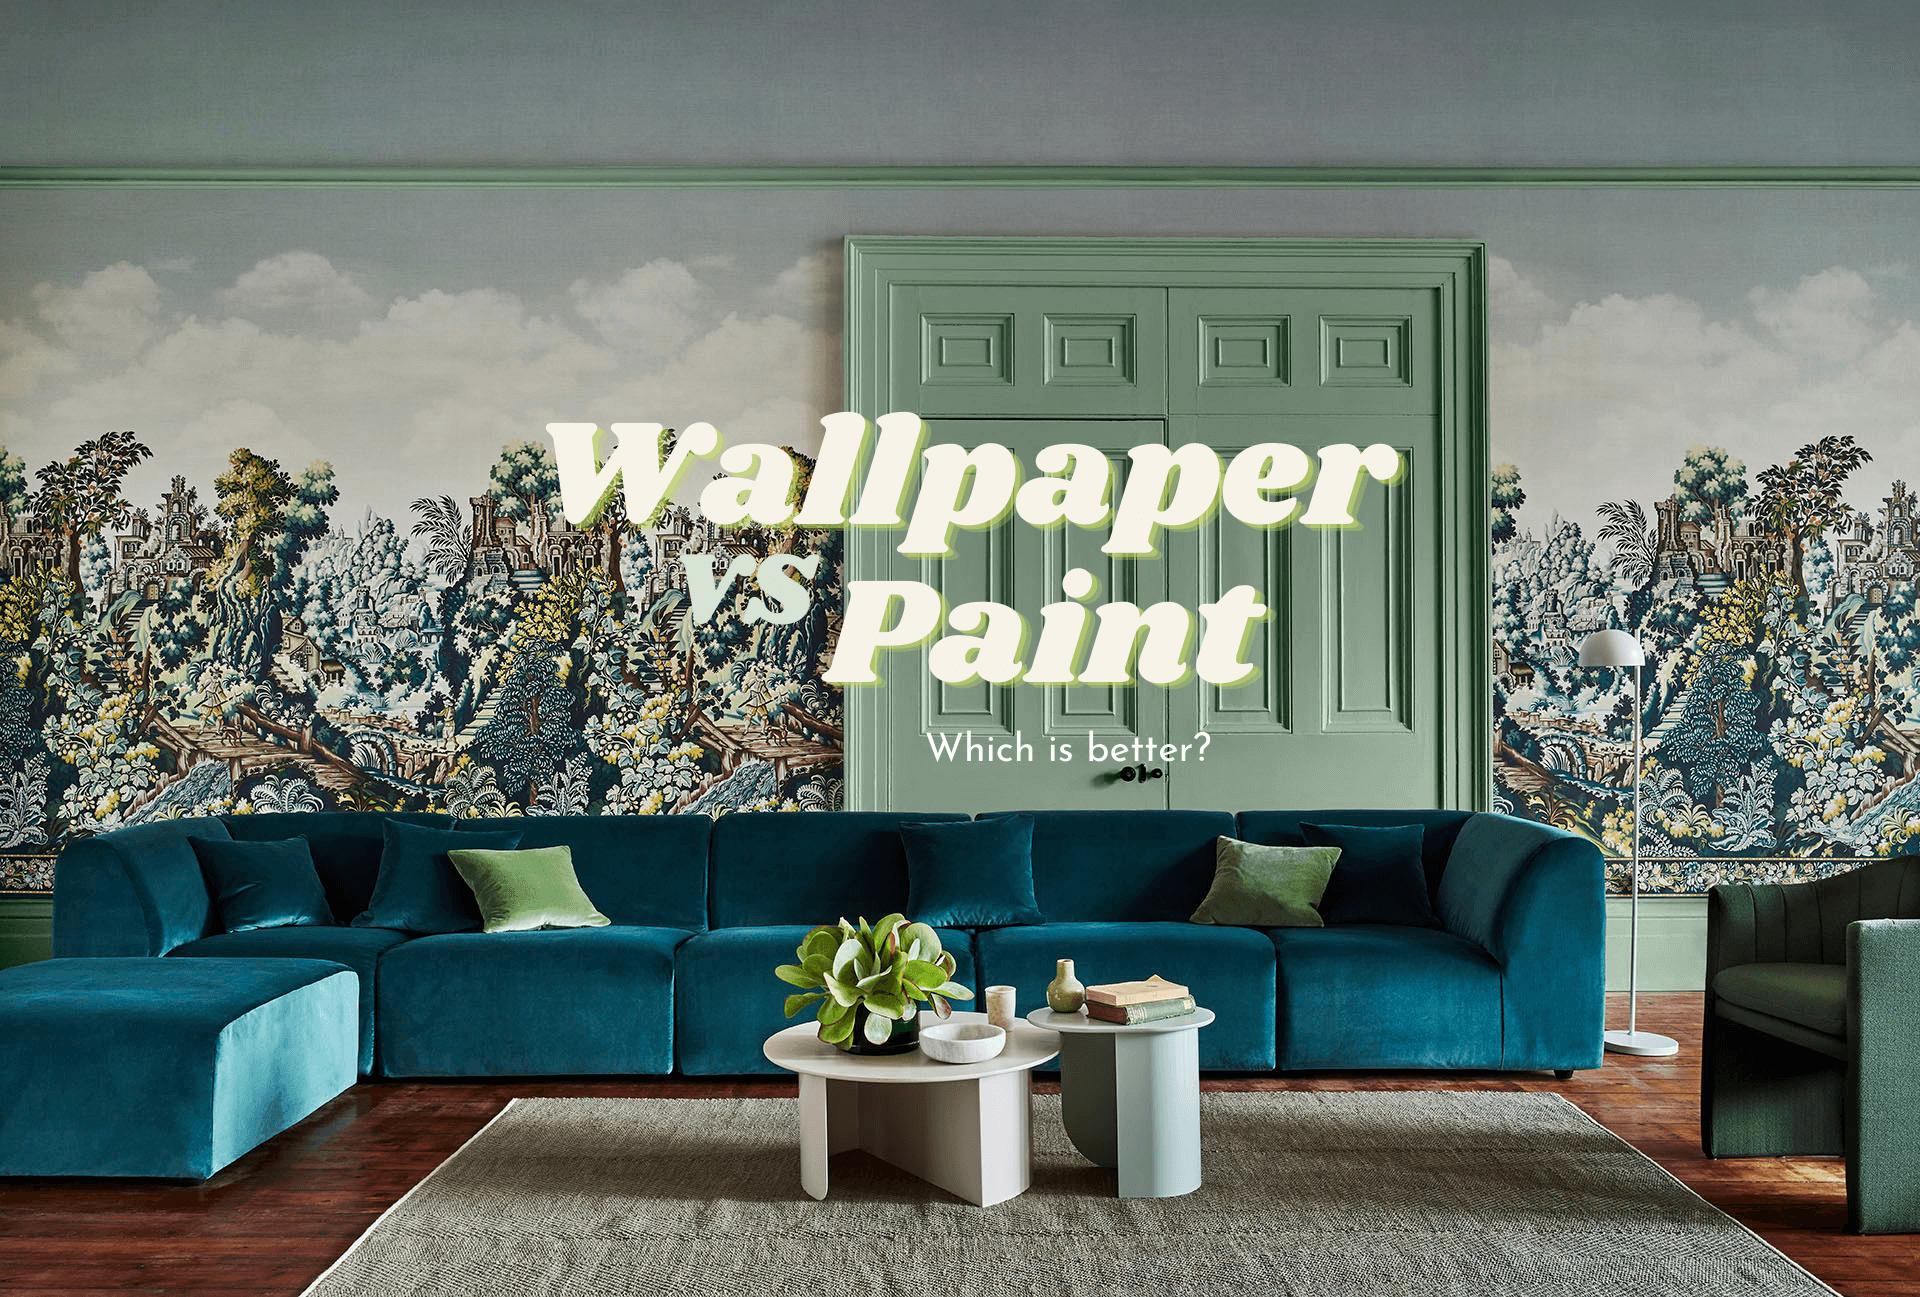 Wallpaper, Wallpaper Singapore